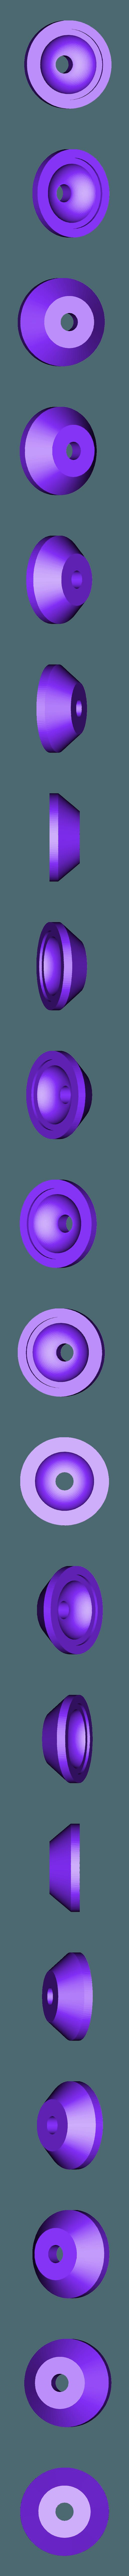 Headlights_2_Front_Headlights_Grill_Version.stl Descargar archivo STL CHEVY VAN G20 RC BODY SCALER AXIAL MST TRX4 RC4WD • Modelo para imprimir en 3D, ilyakapitonov